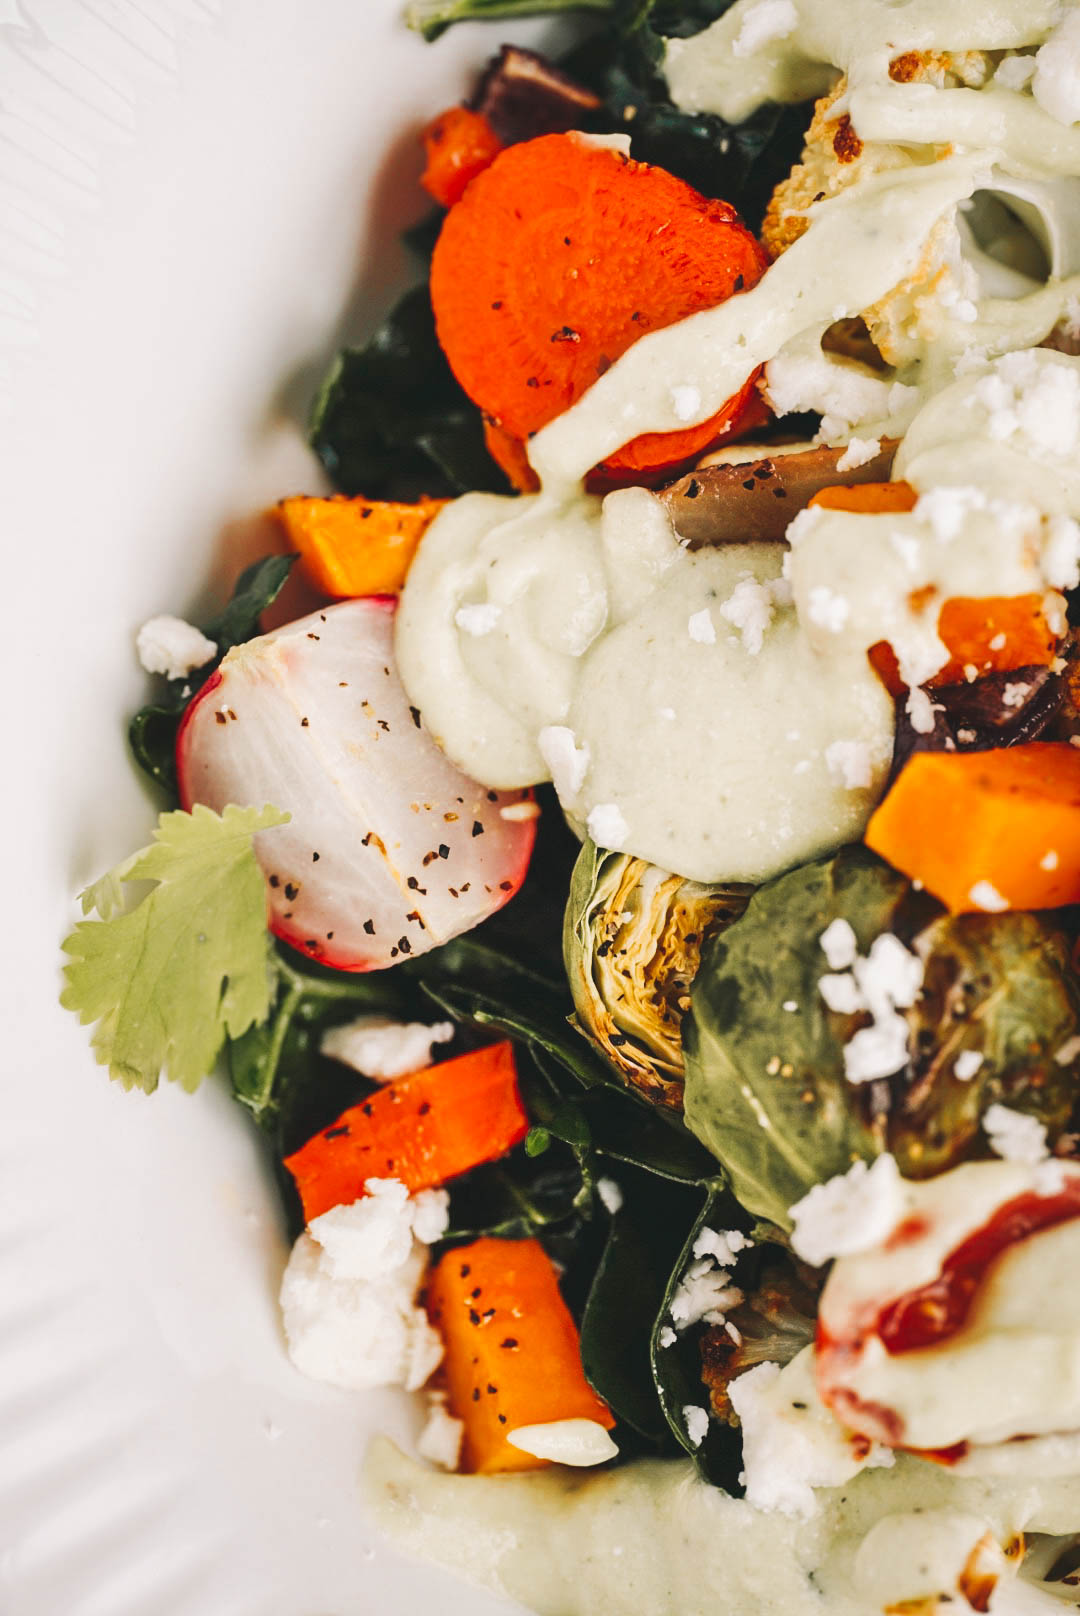 creamy salad dressing on veggies in white bowl